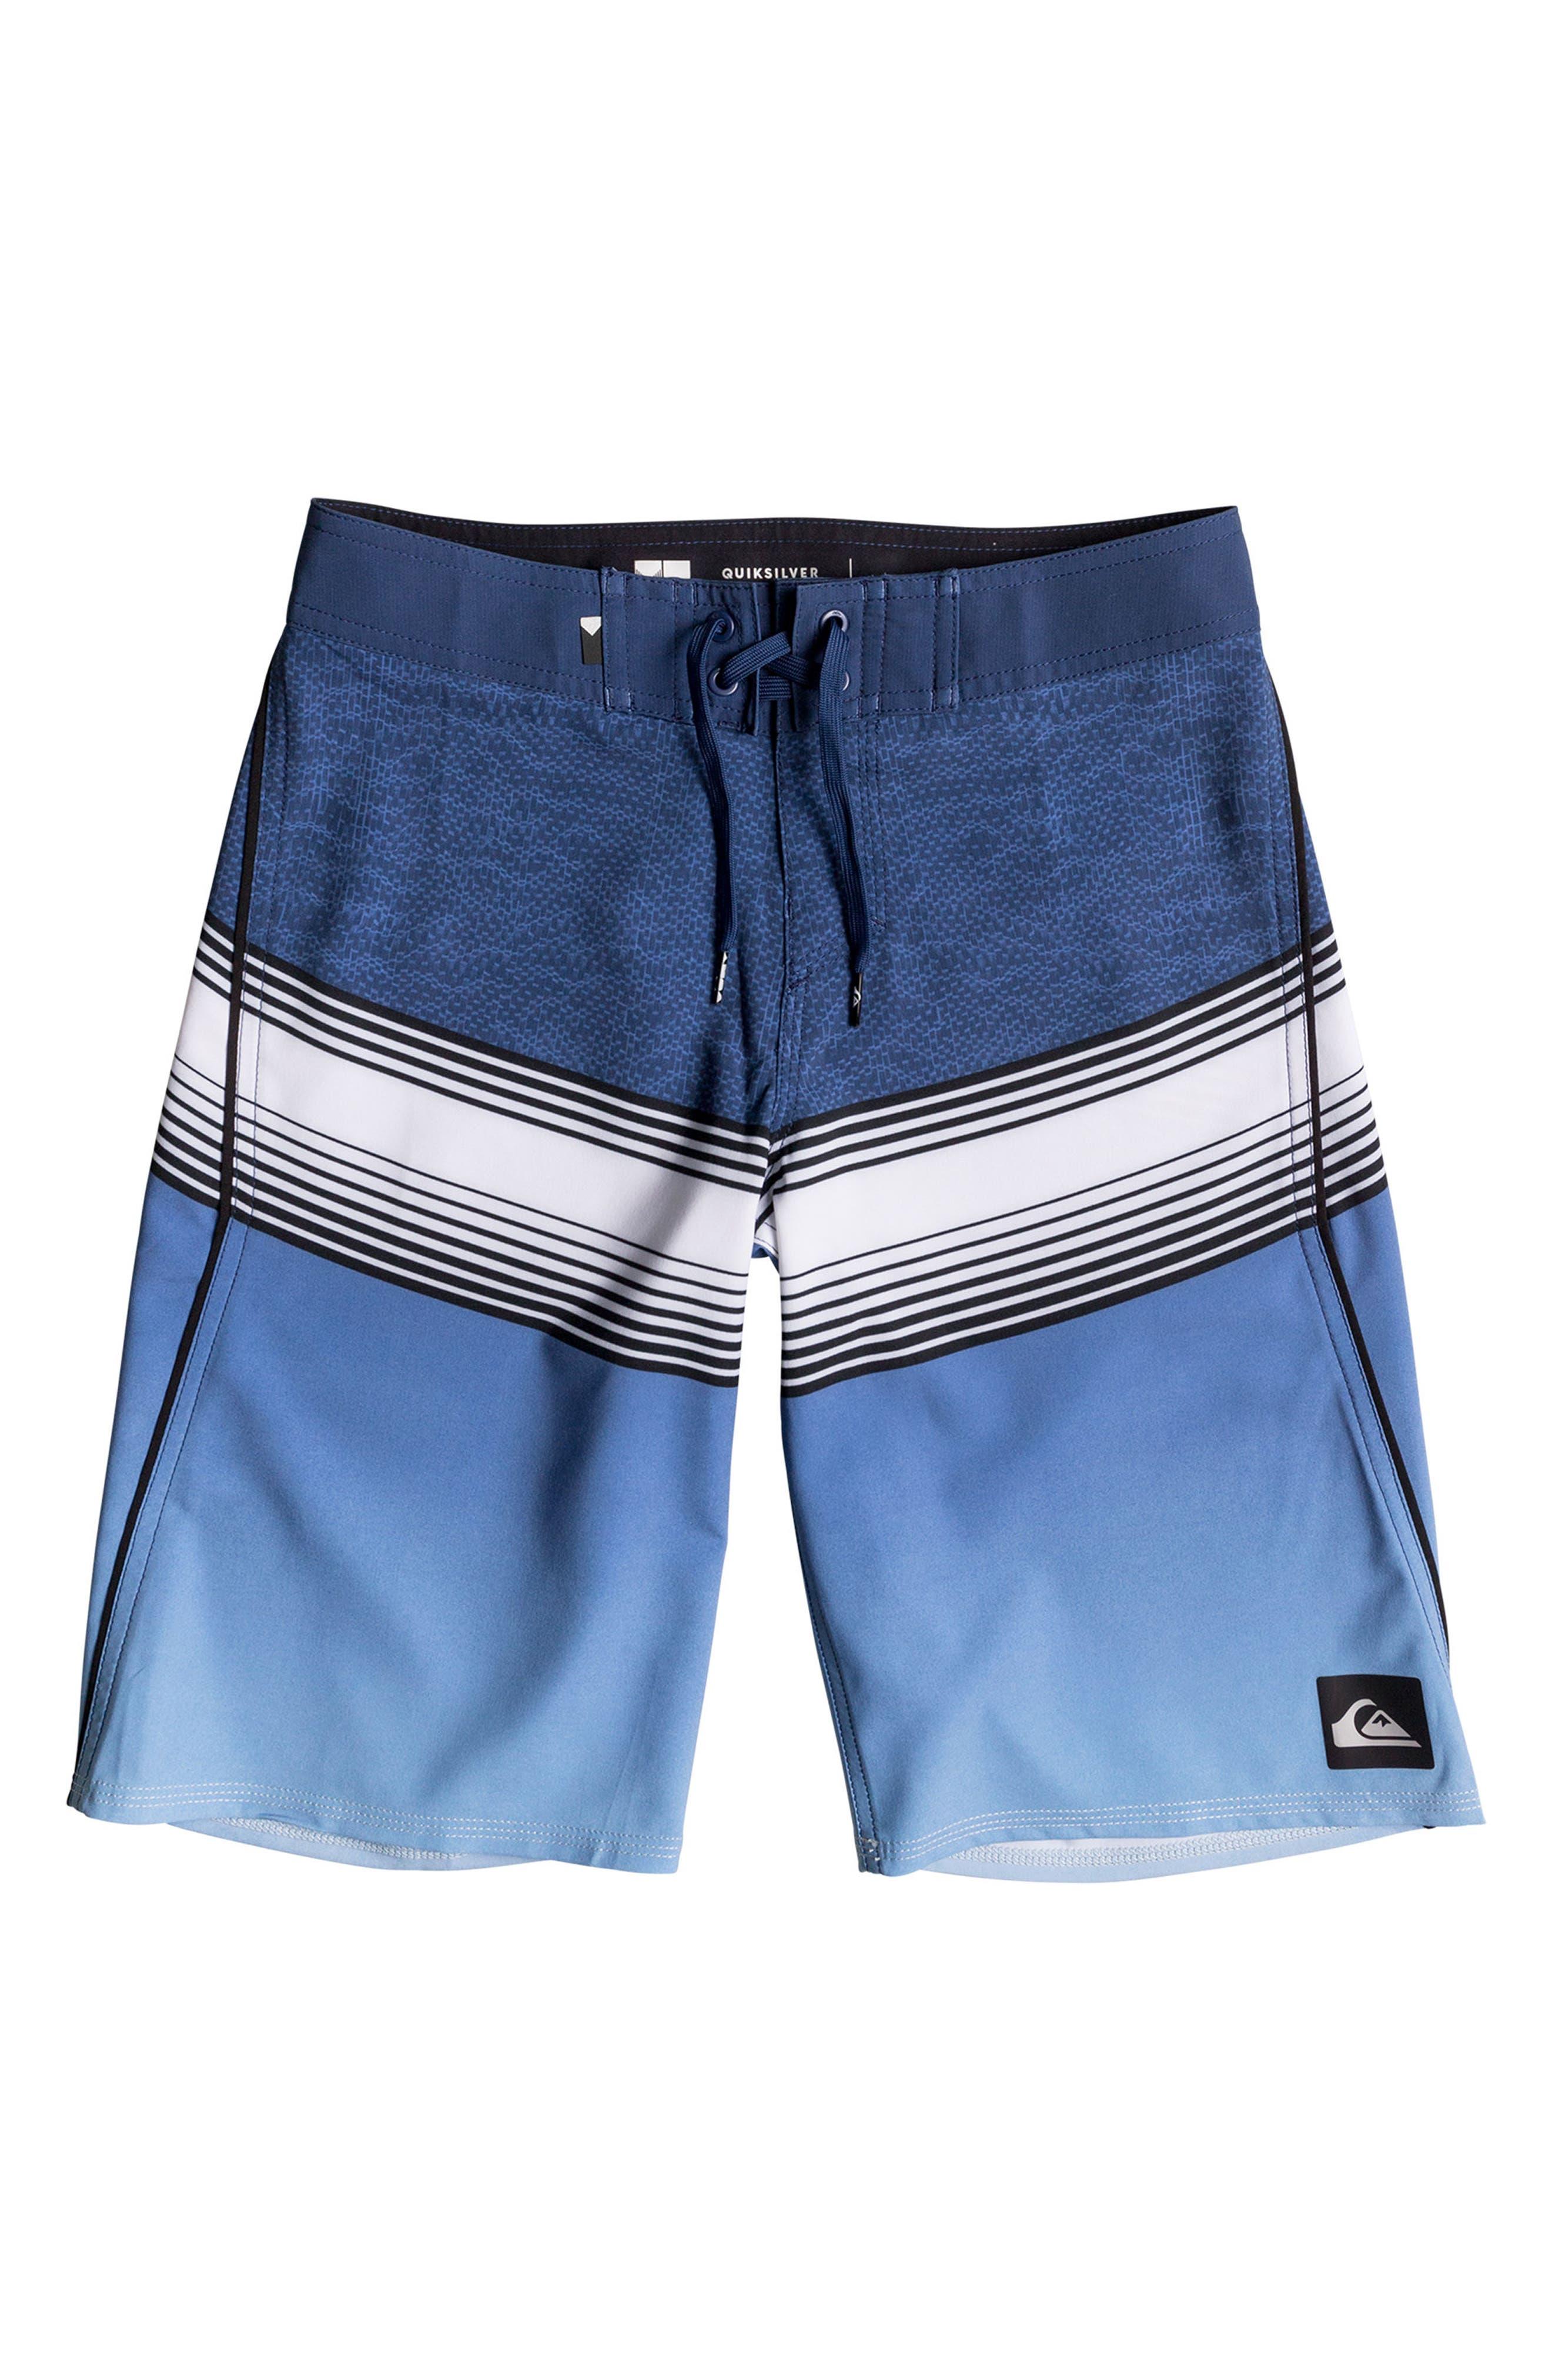 Division Fade Board Shorts,                         Main,                         color, 401